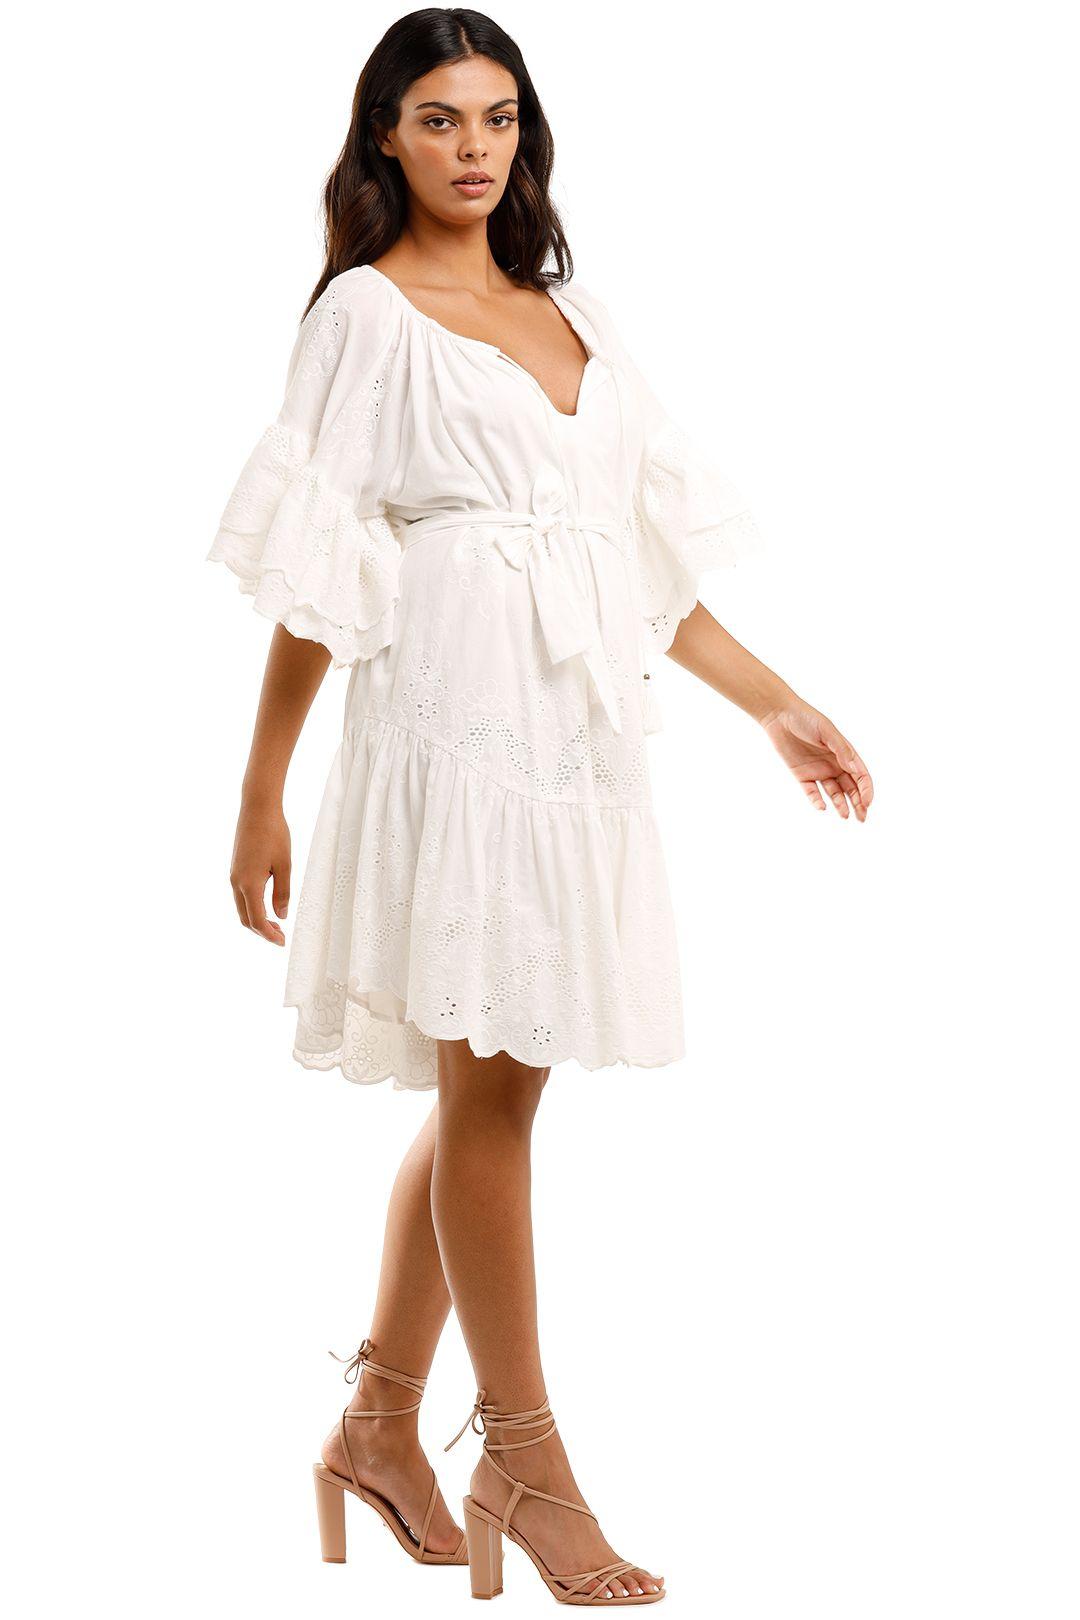 Spell Capulet Broderie Anglaise Frill Smock White Plunge Neckline Beach Dress